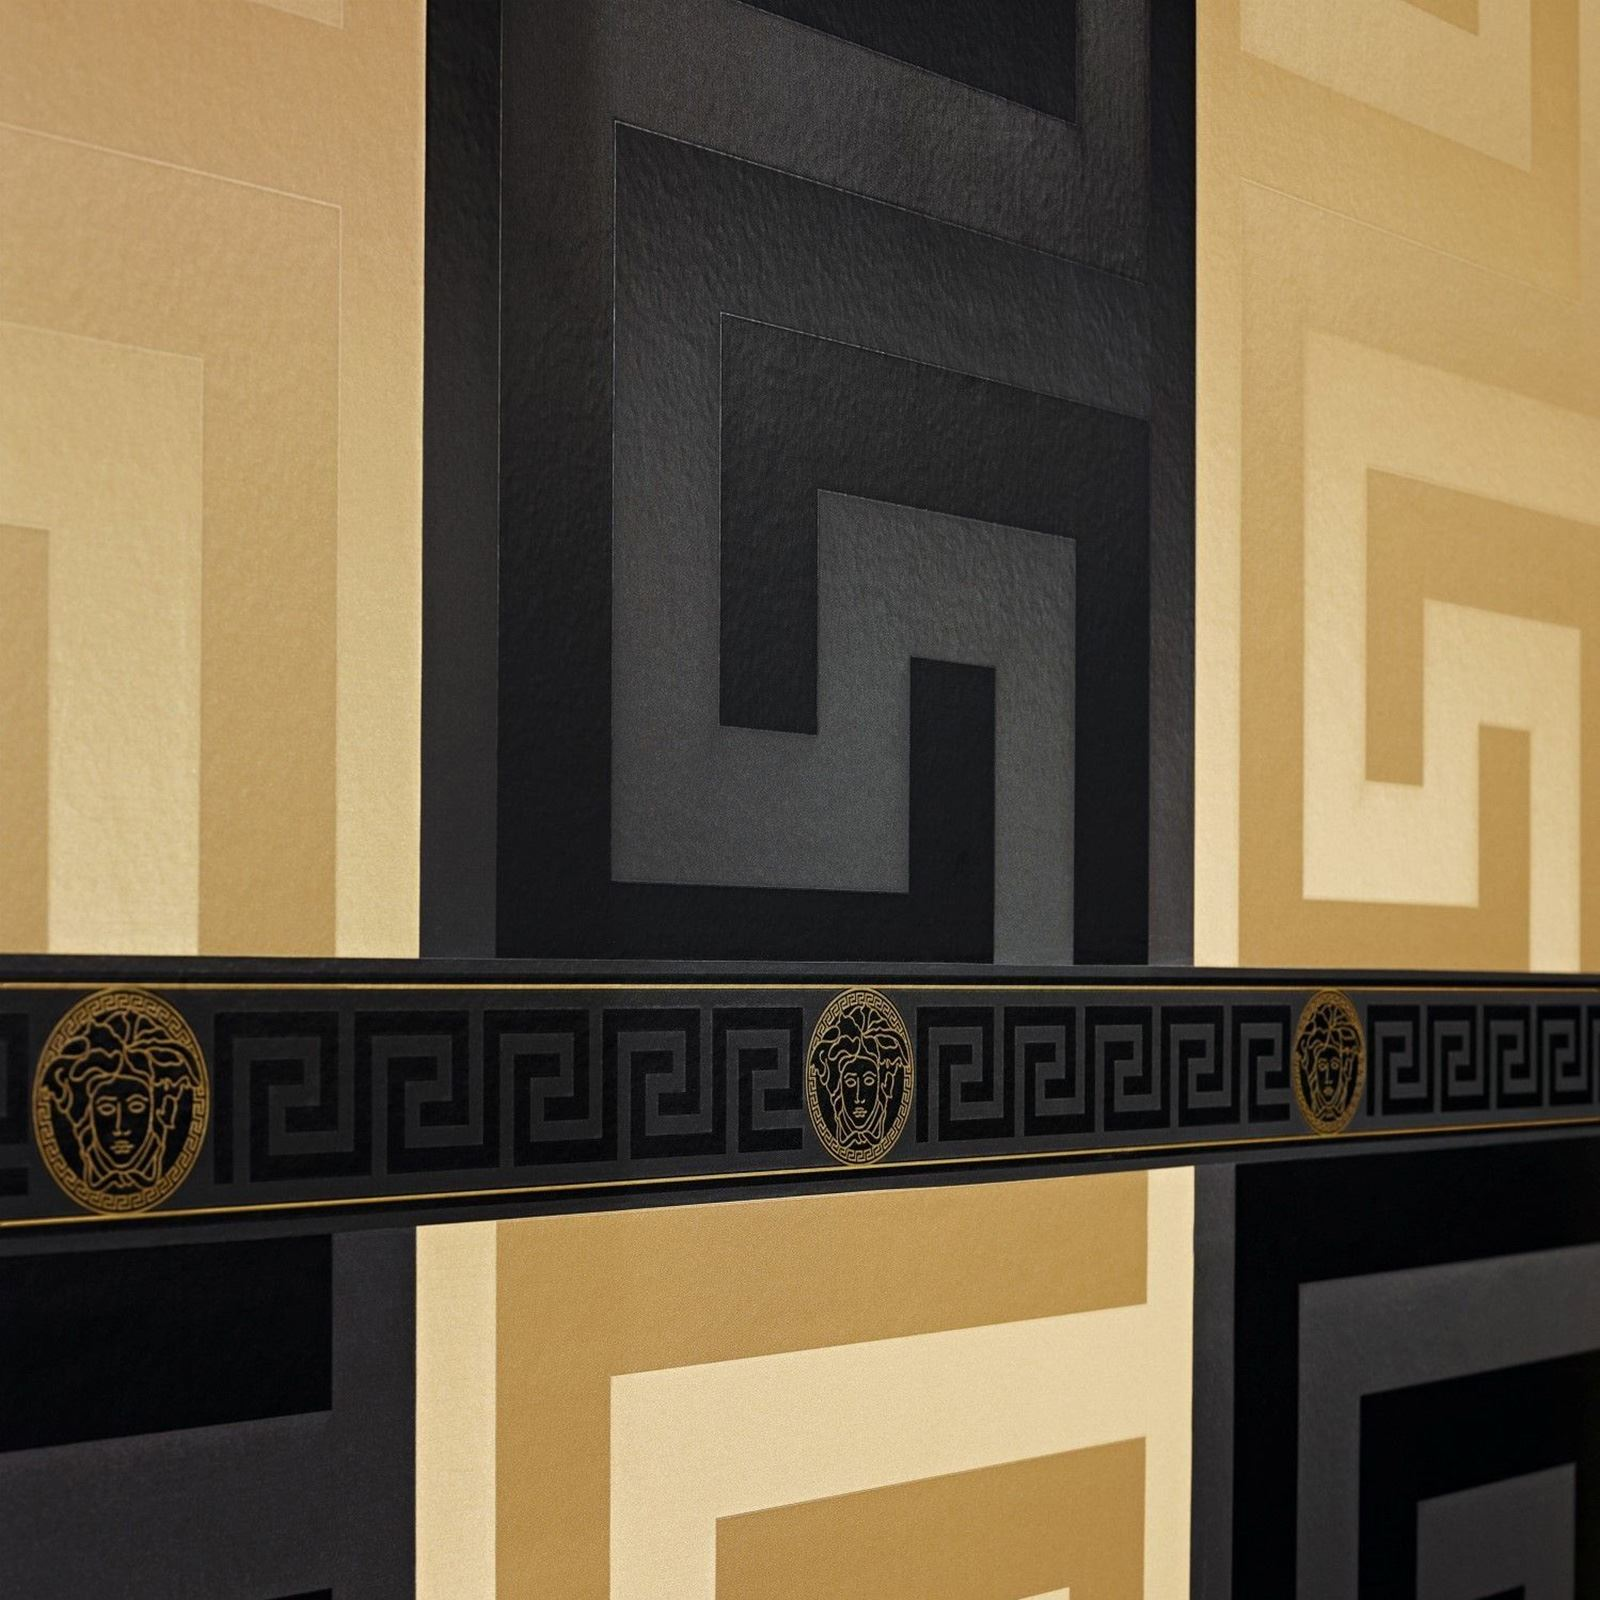 Greek Key Wall Decor : Versace designer wallpaper and border range gold silver